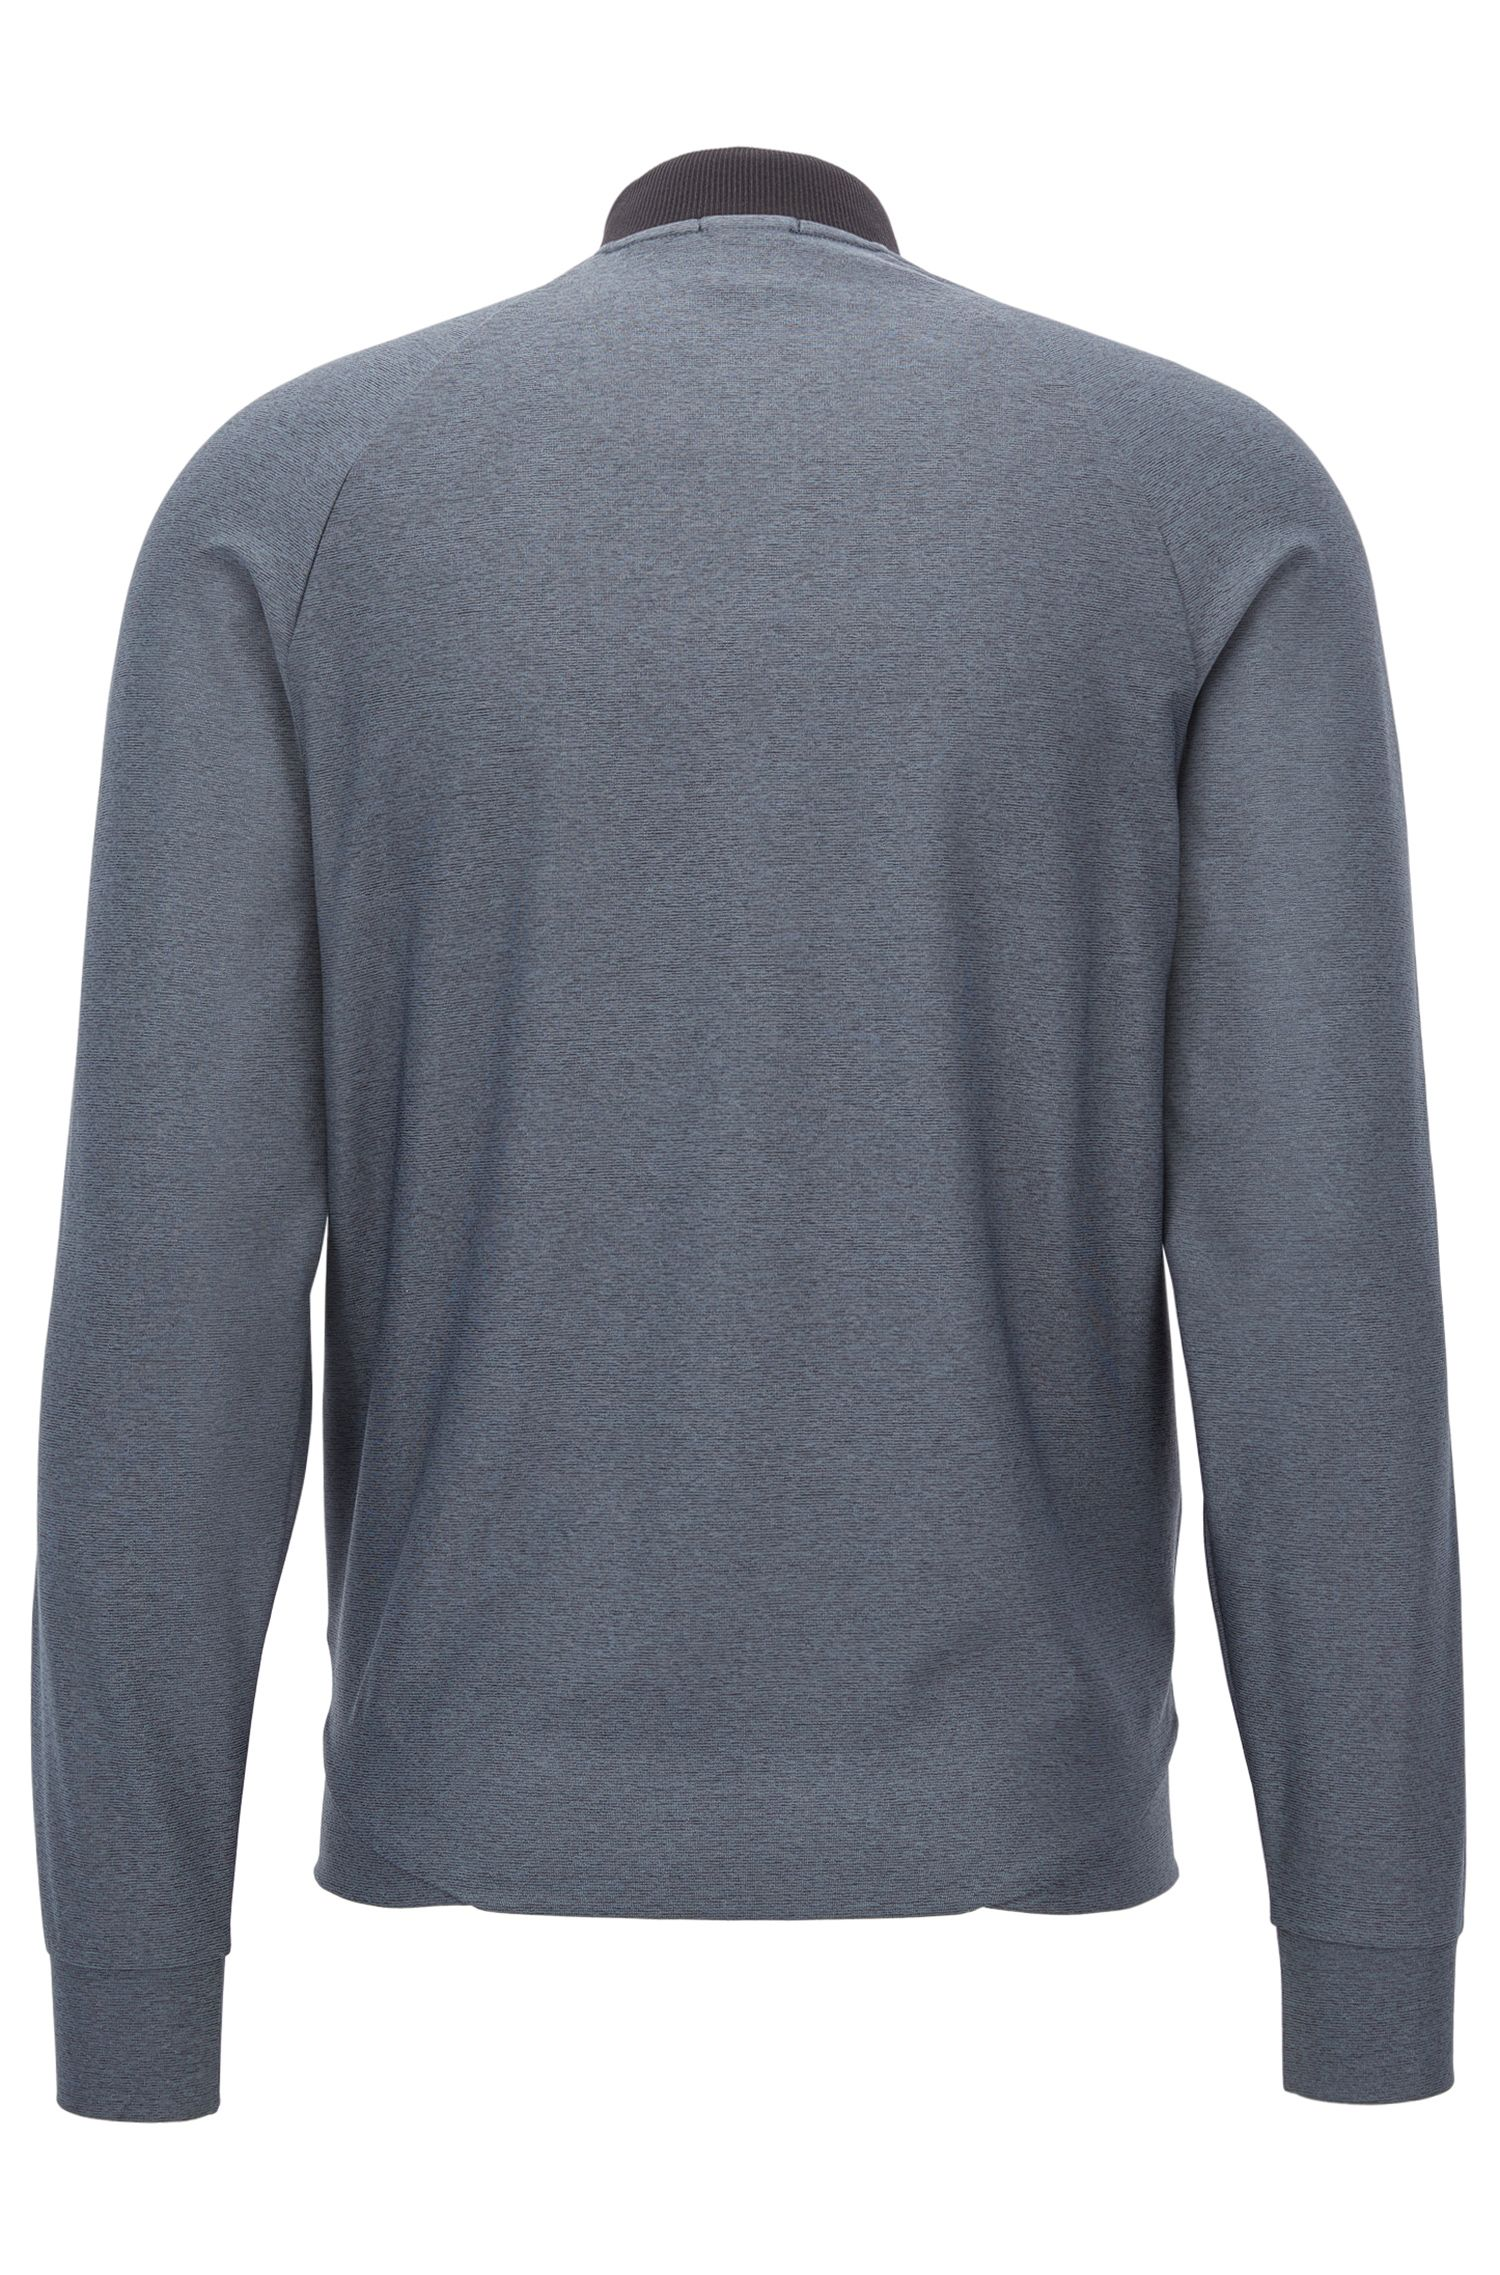 Gemêleerd sweatshirt met ritssluiting en S.Café®